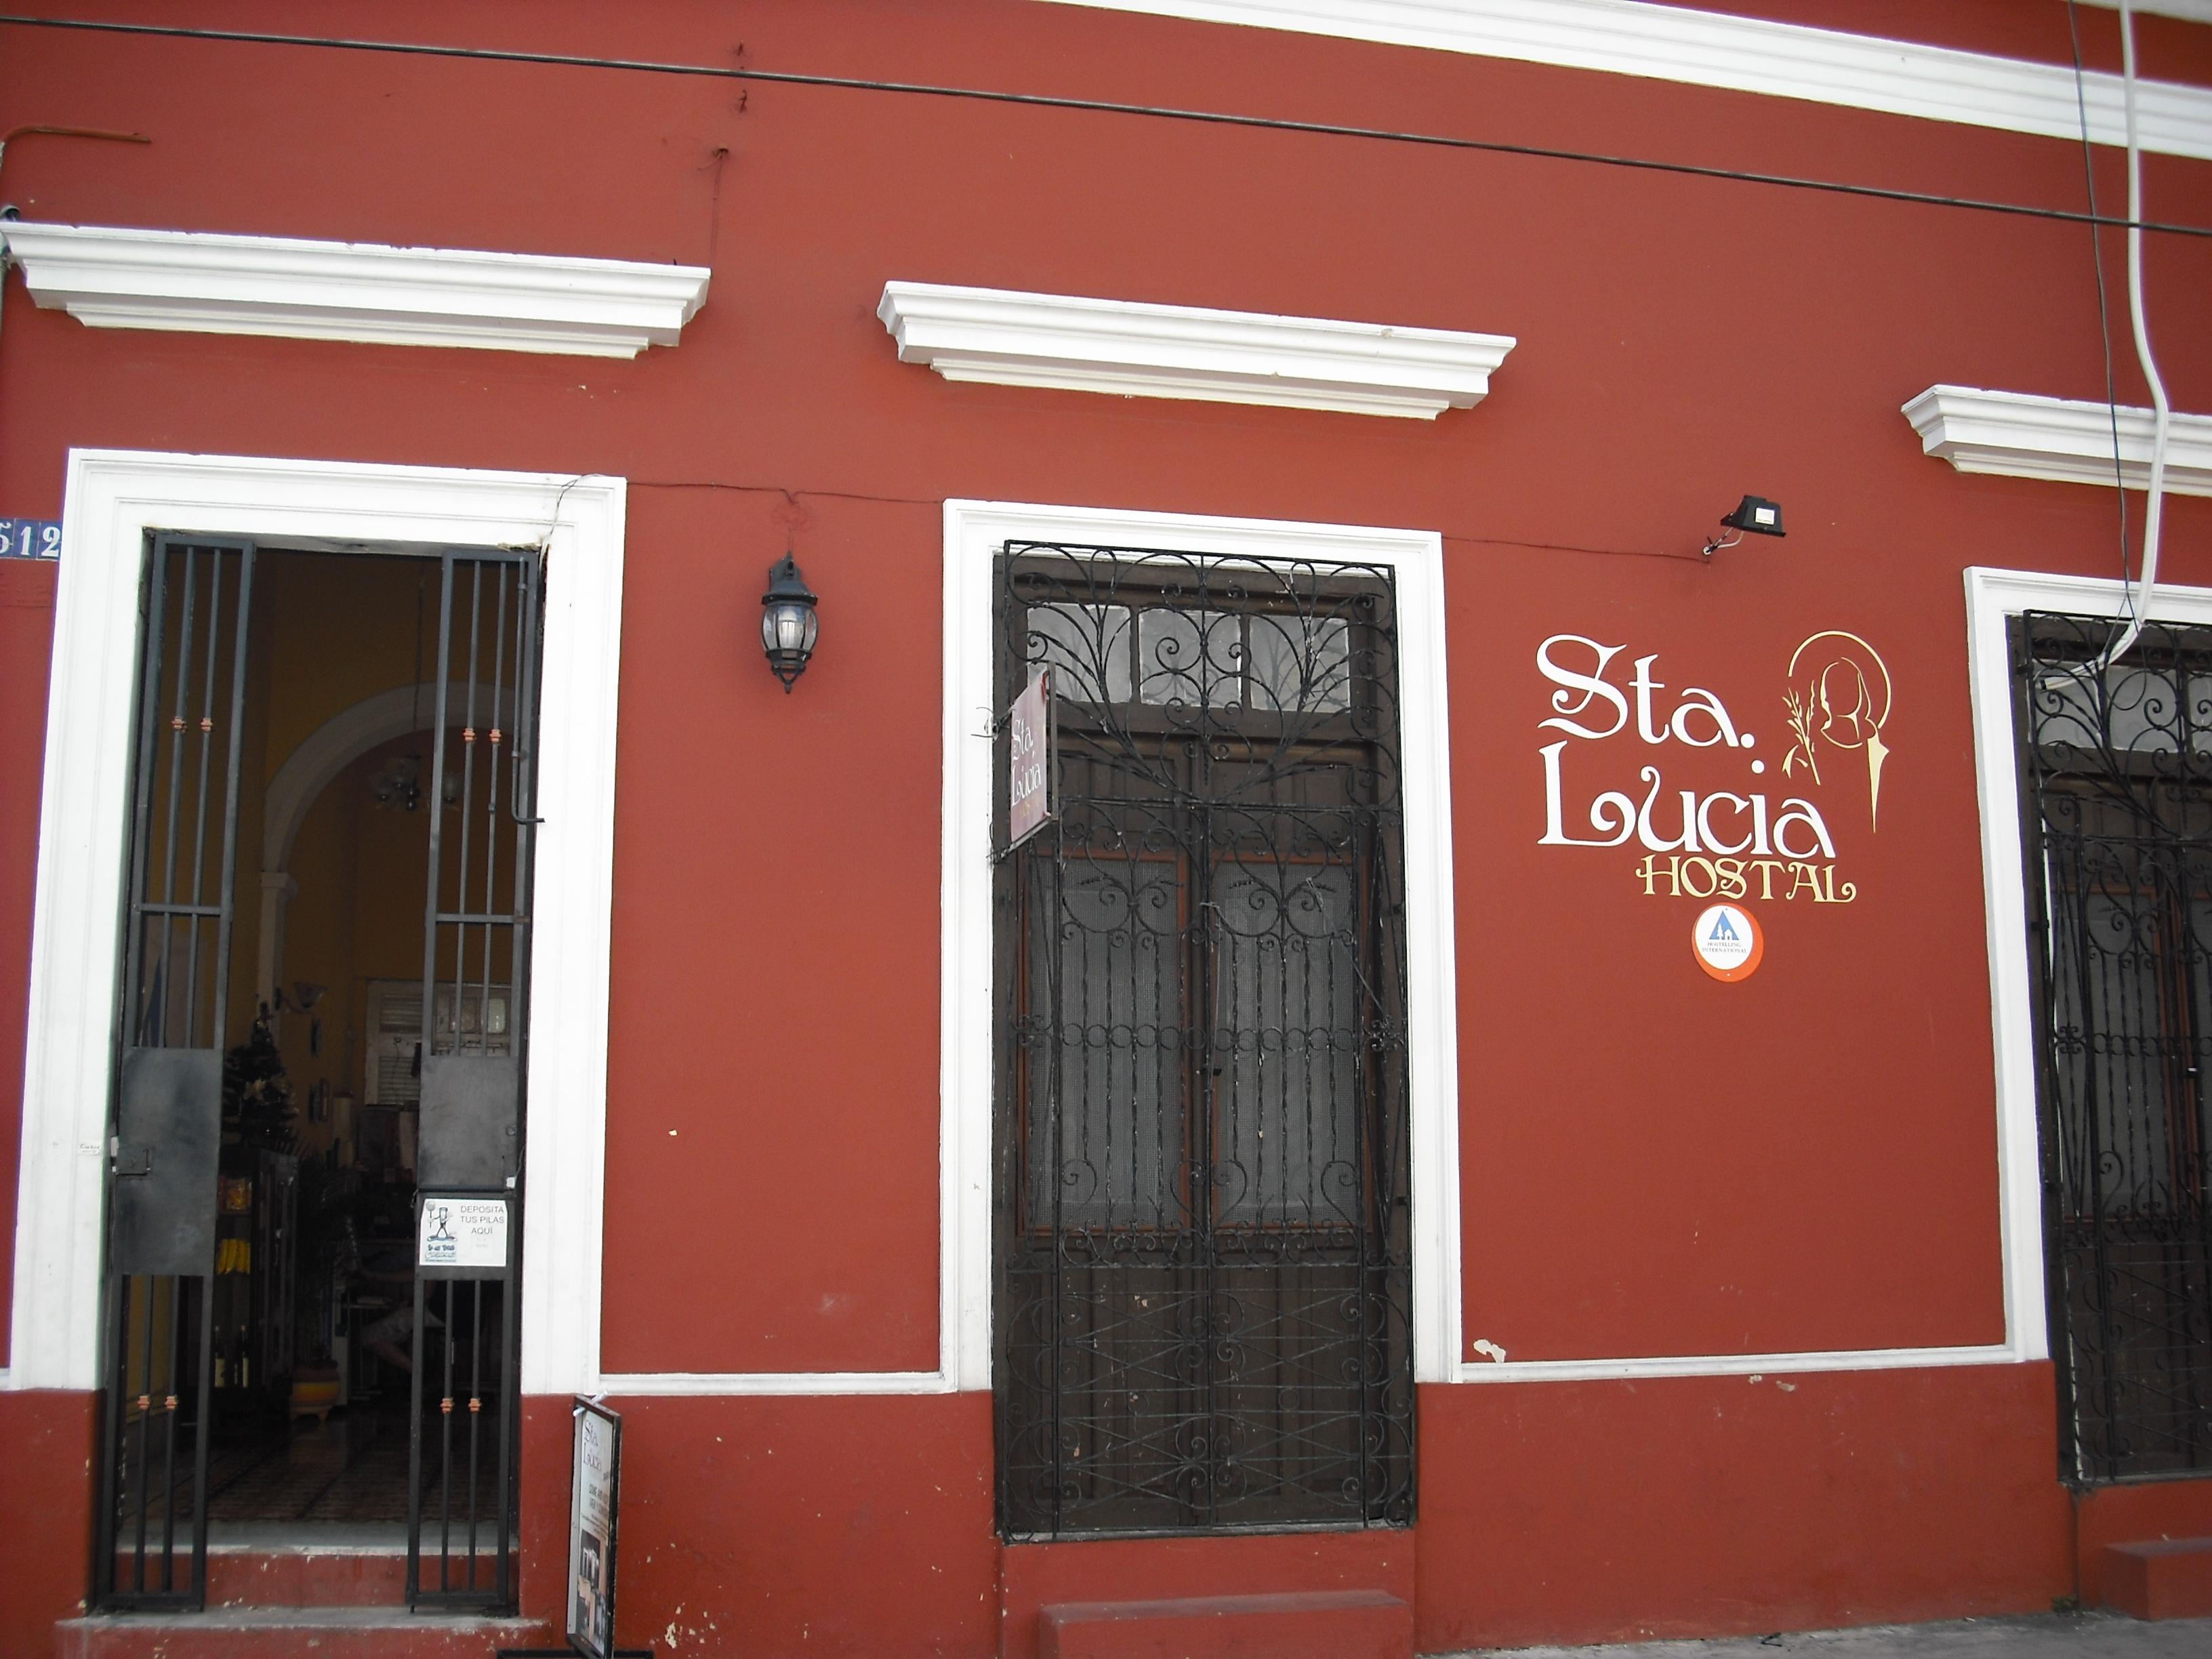 Hostal Santa Lucia